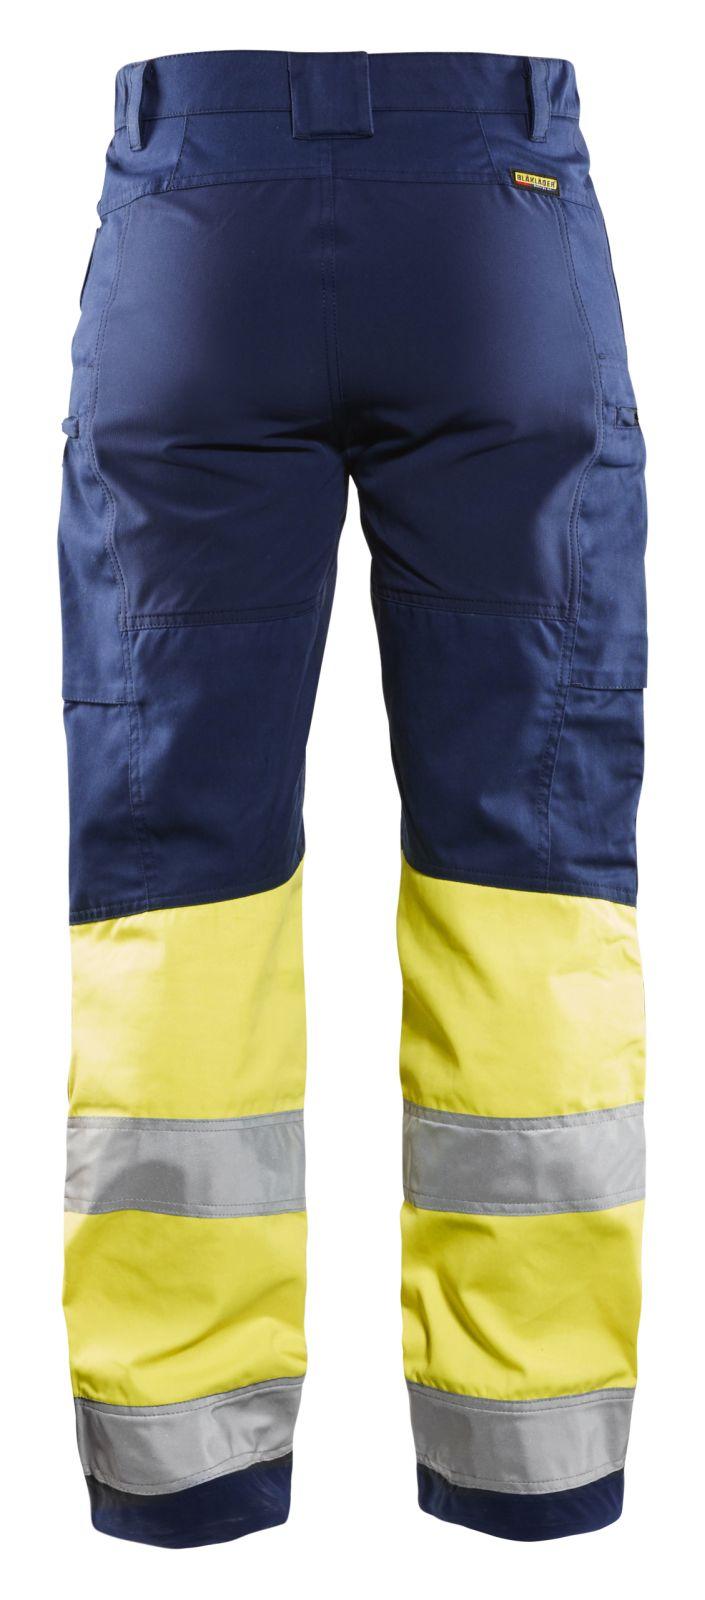 Blaklader Dames werkbroeken 71611811 High Vis marineblauw-geel(8933)